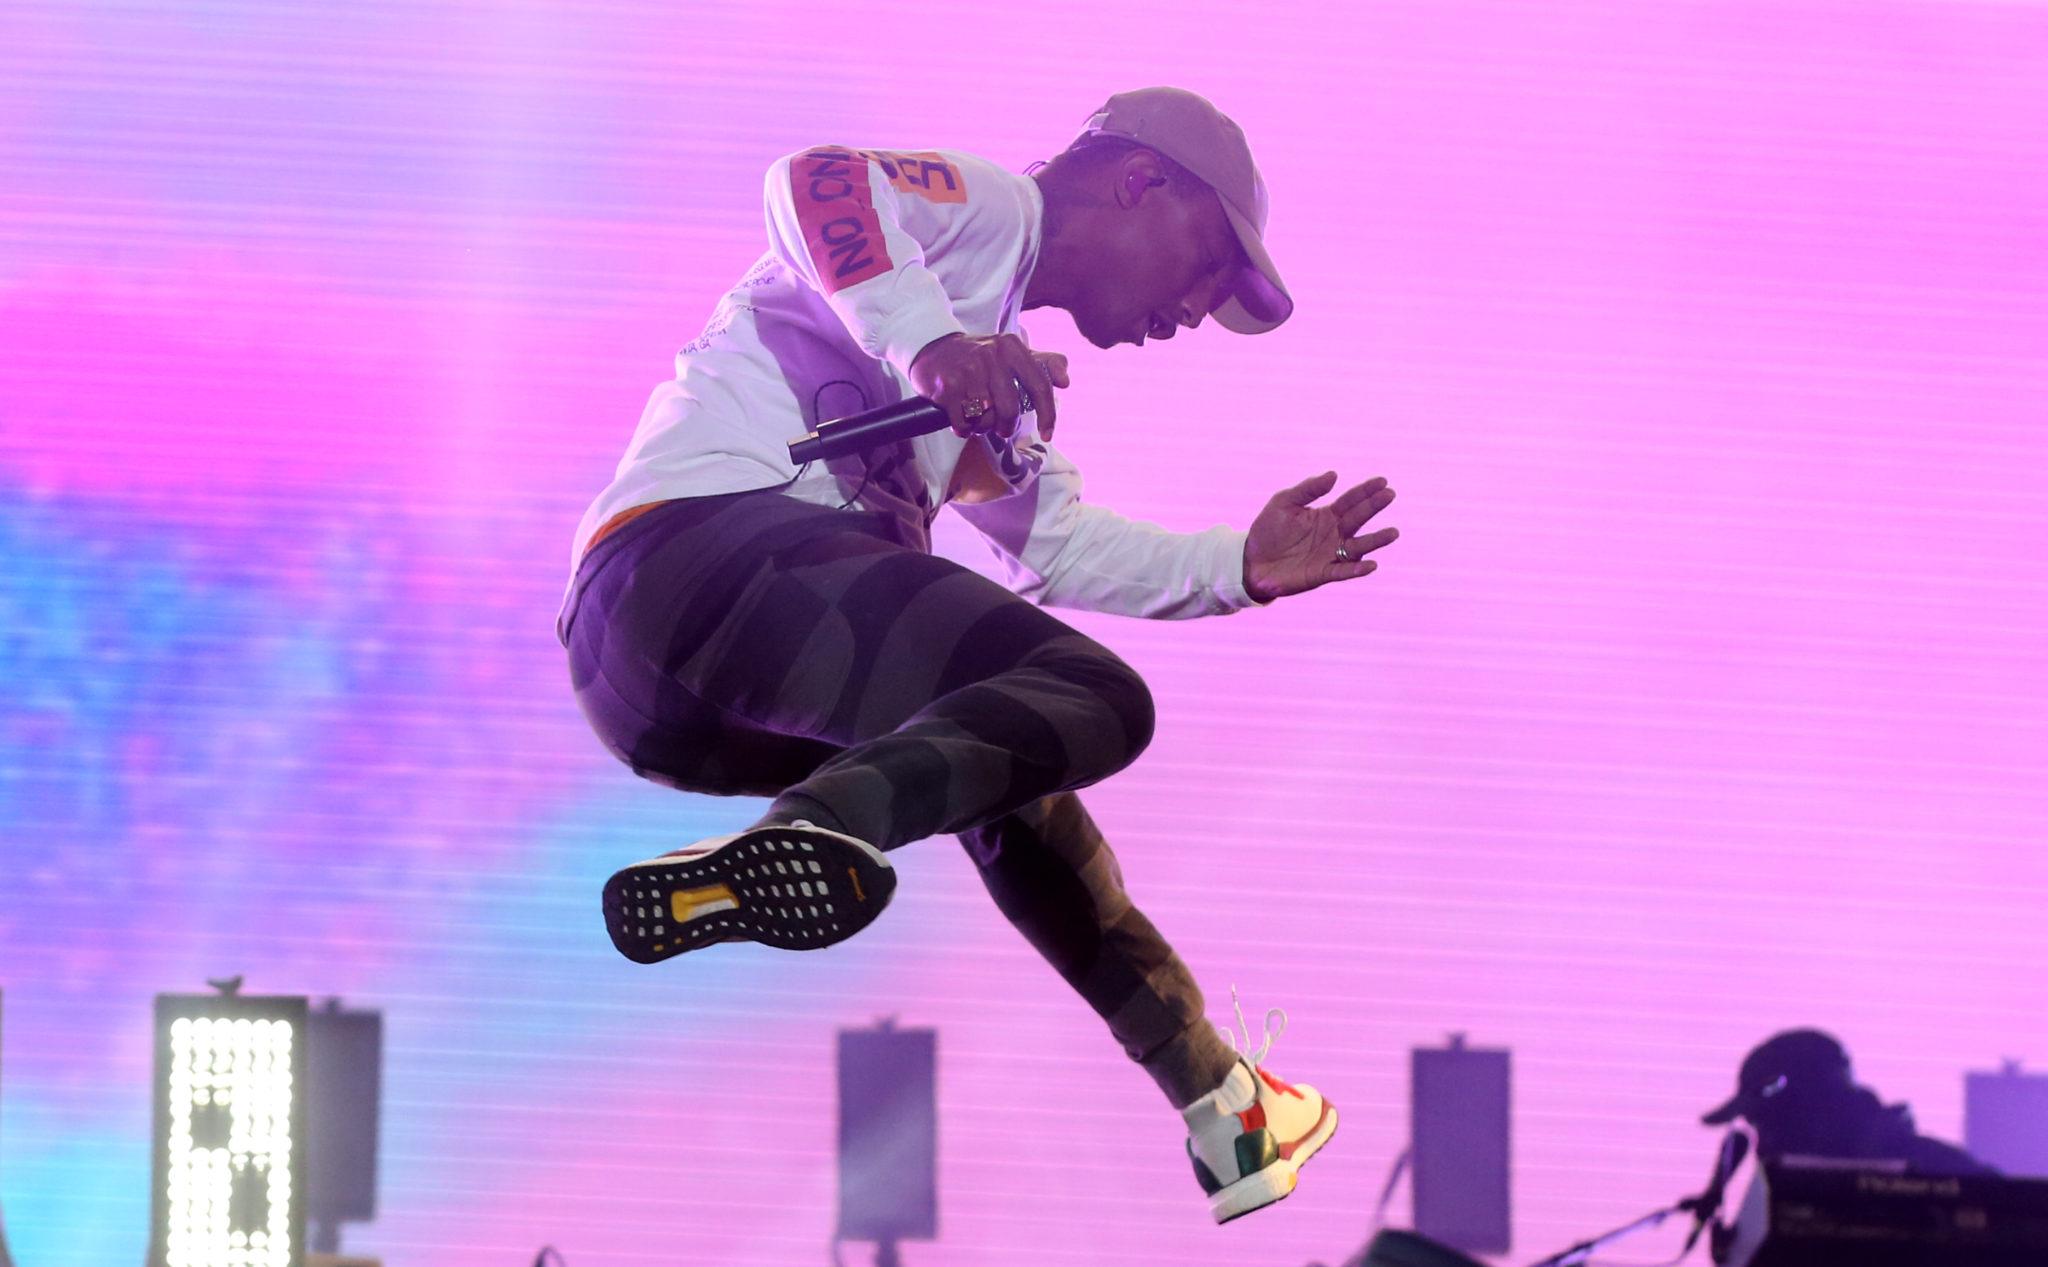 Pharrell Williams at Electric Picnic 2018